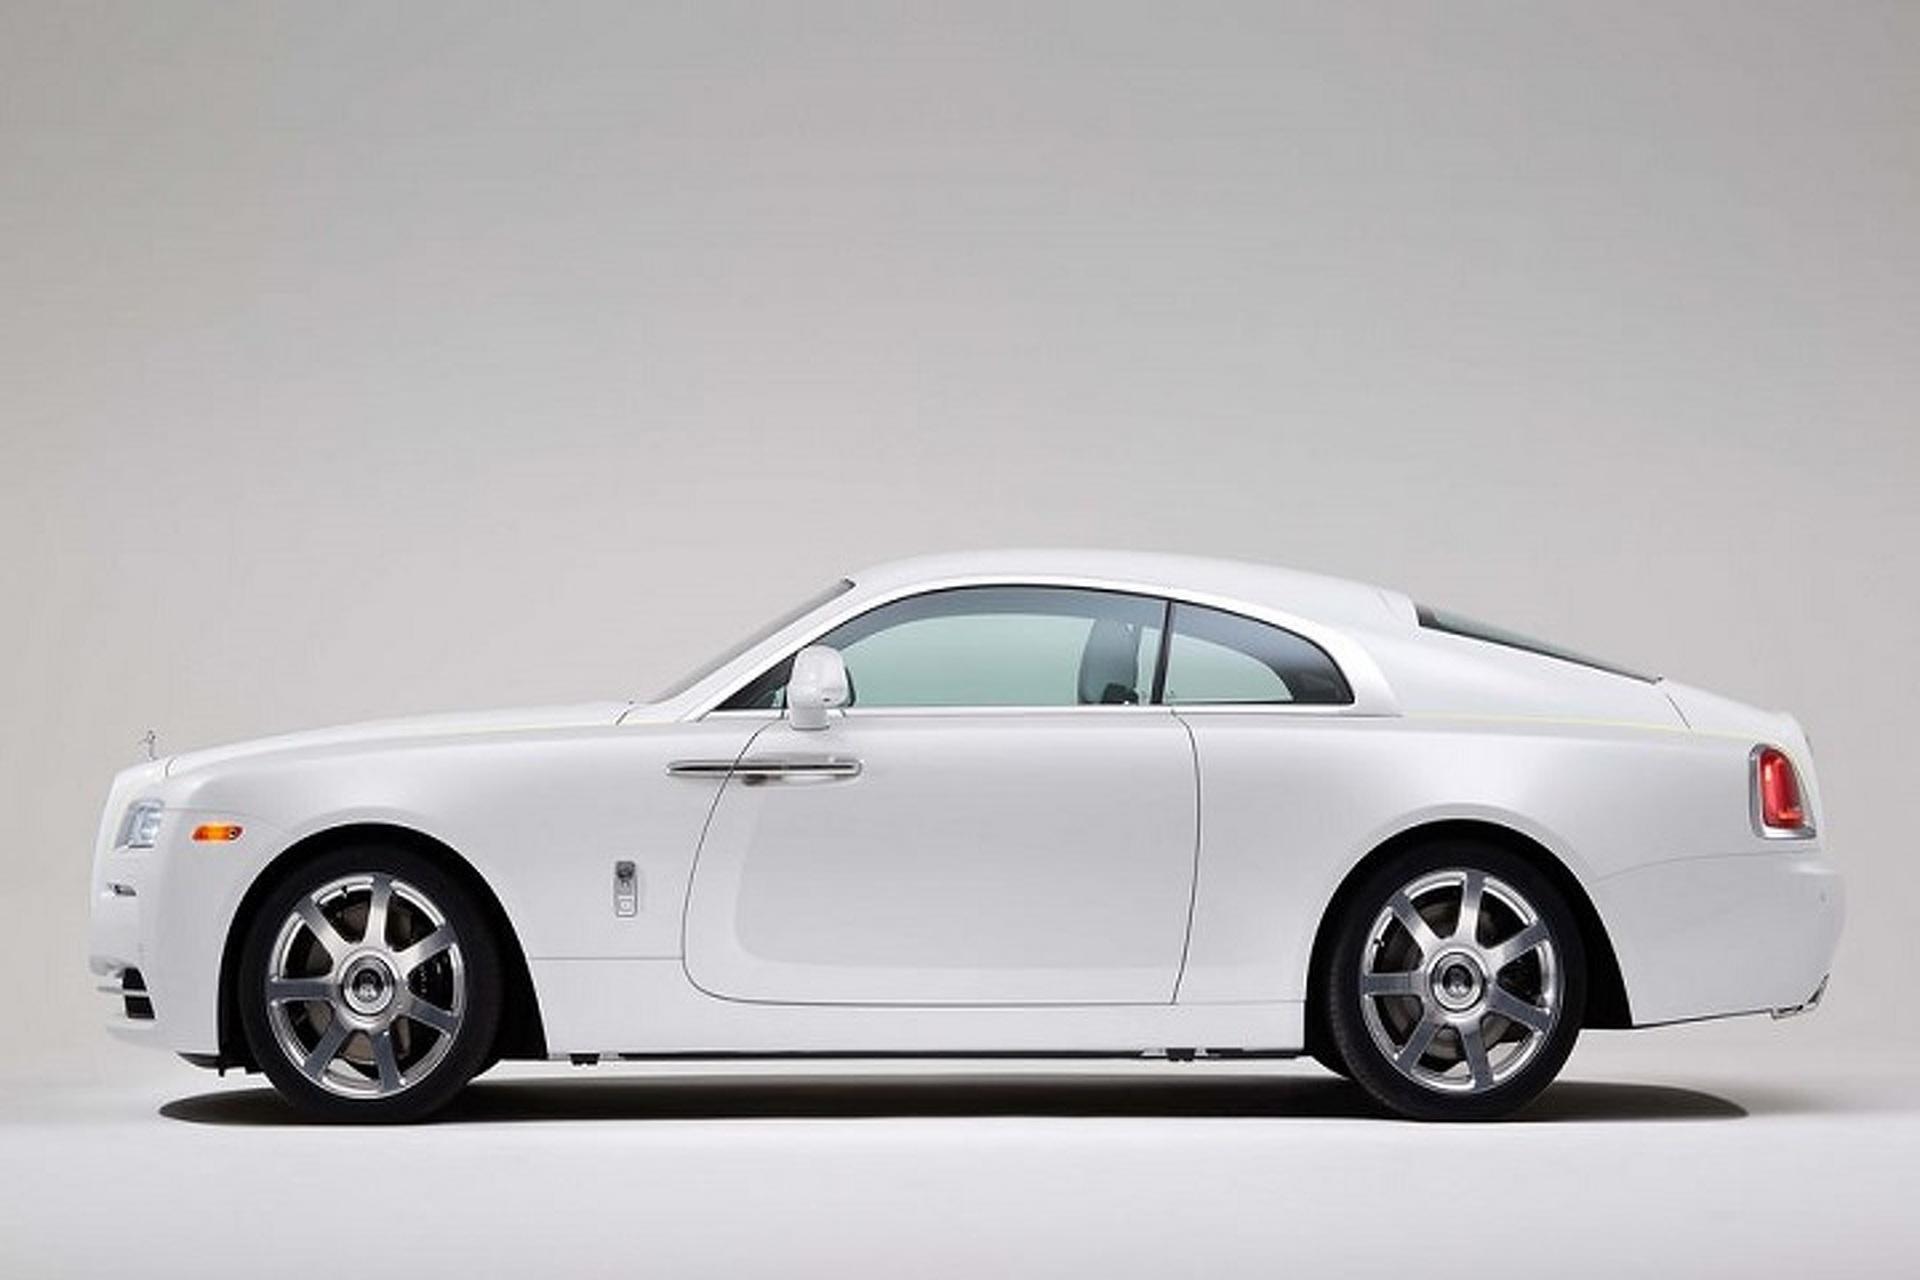 Rapper Tyga Splurges on a Rolls-Royce Wraith